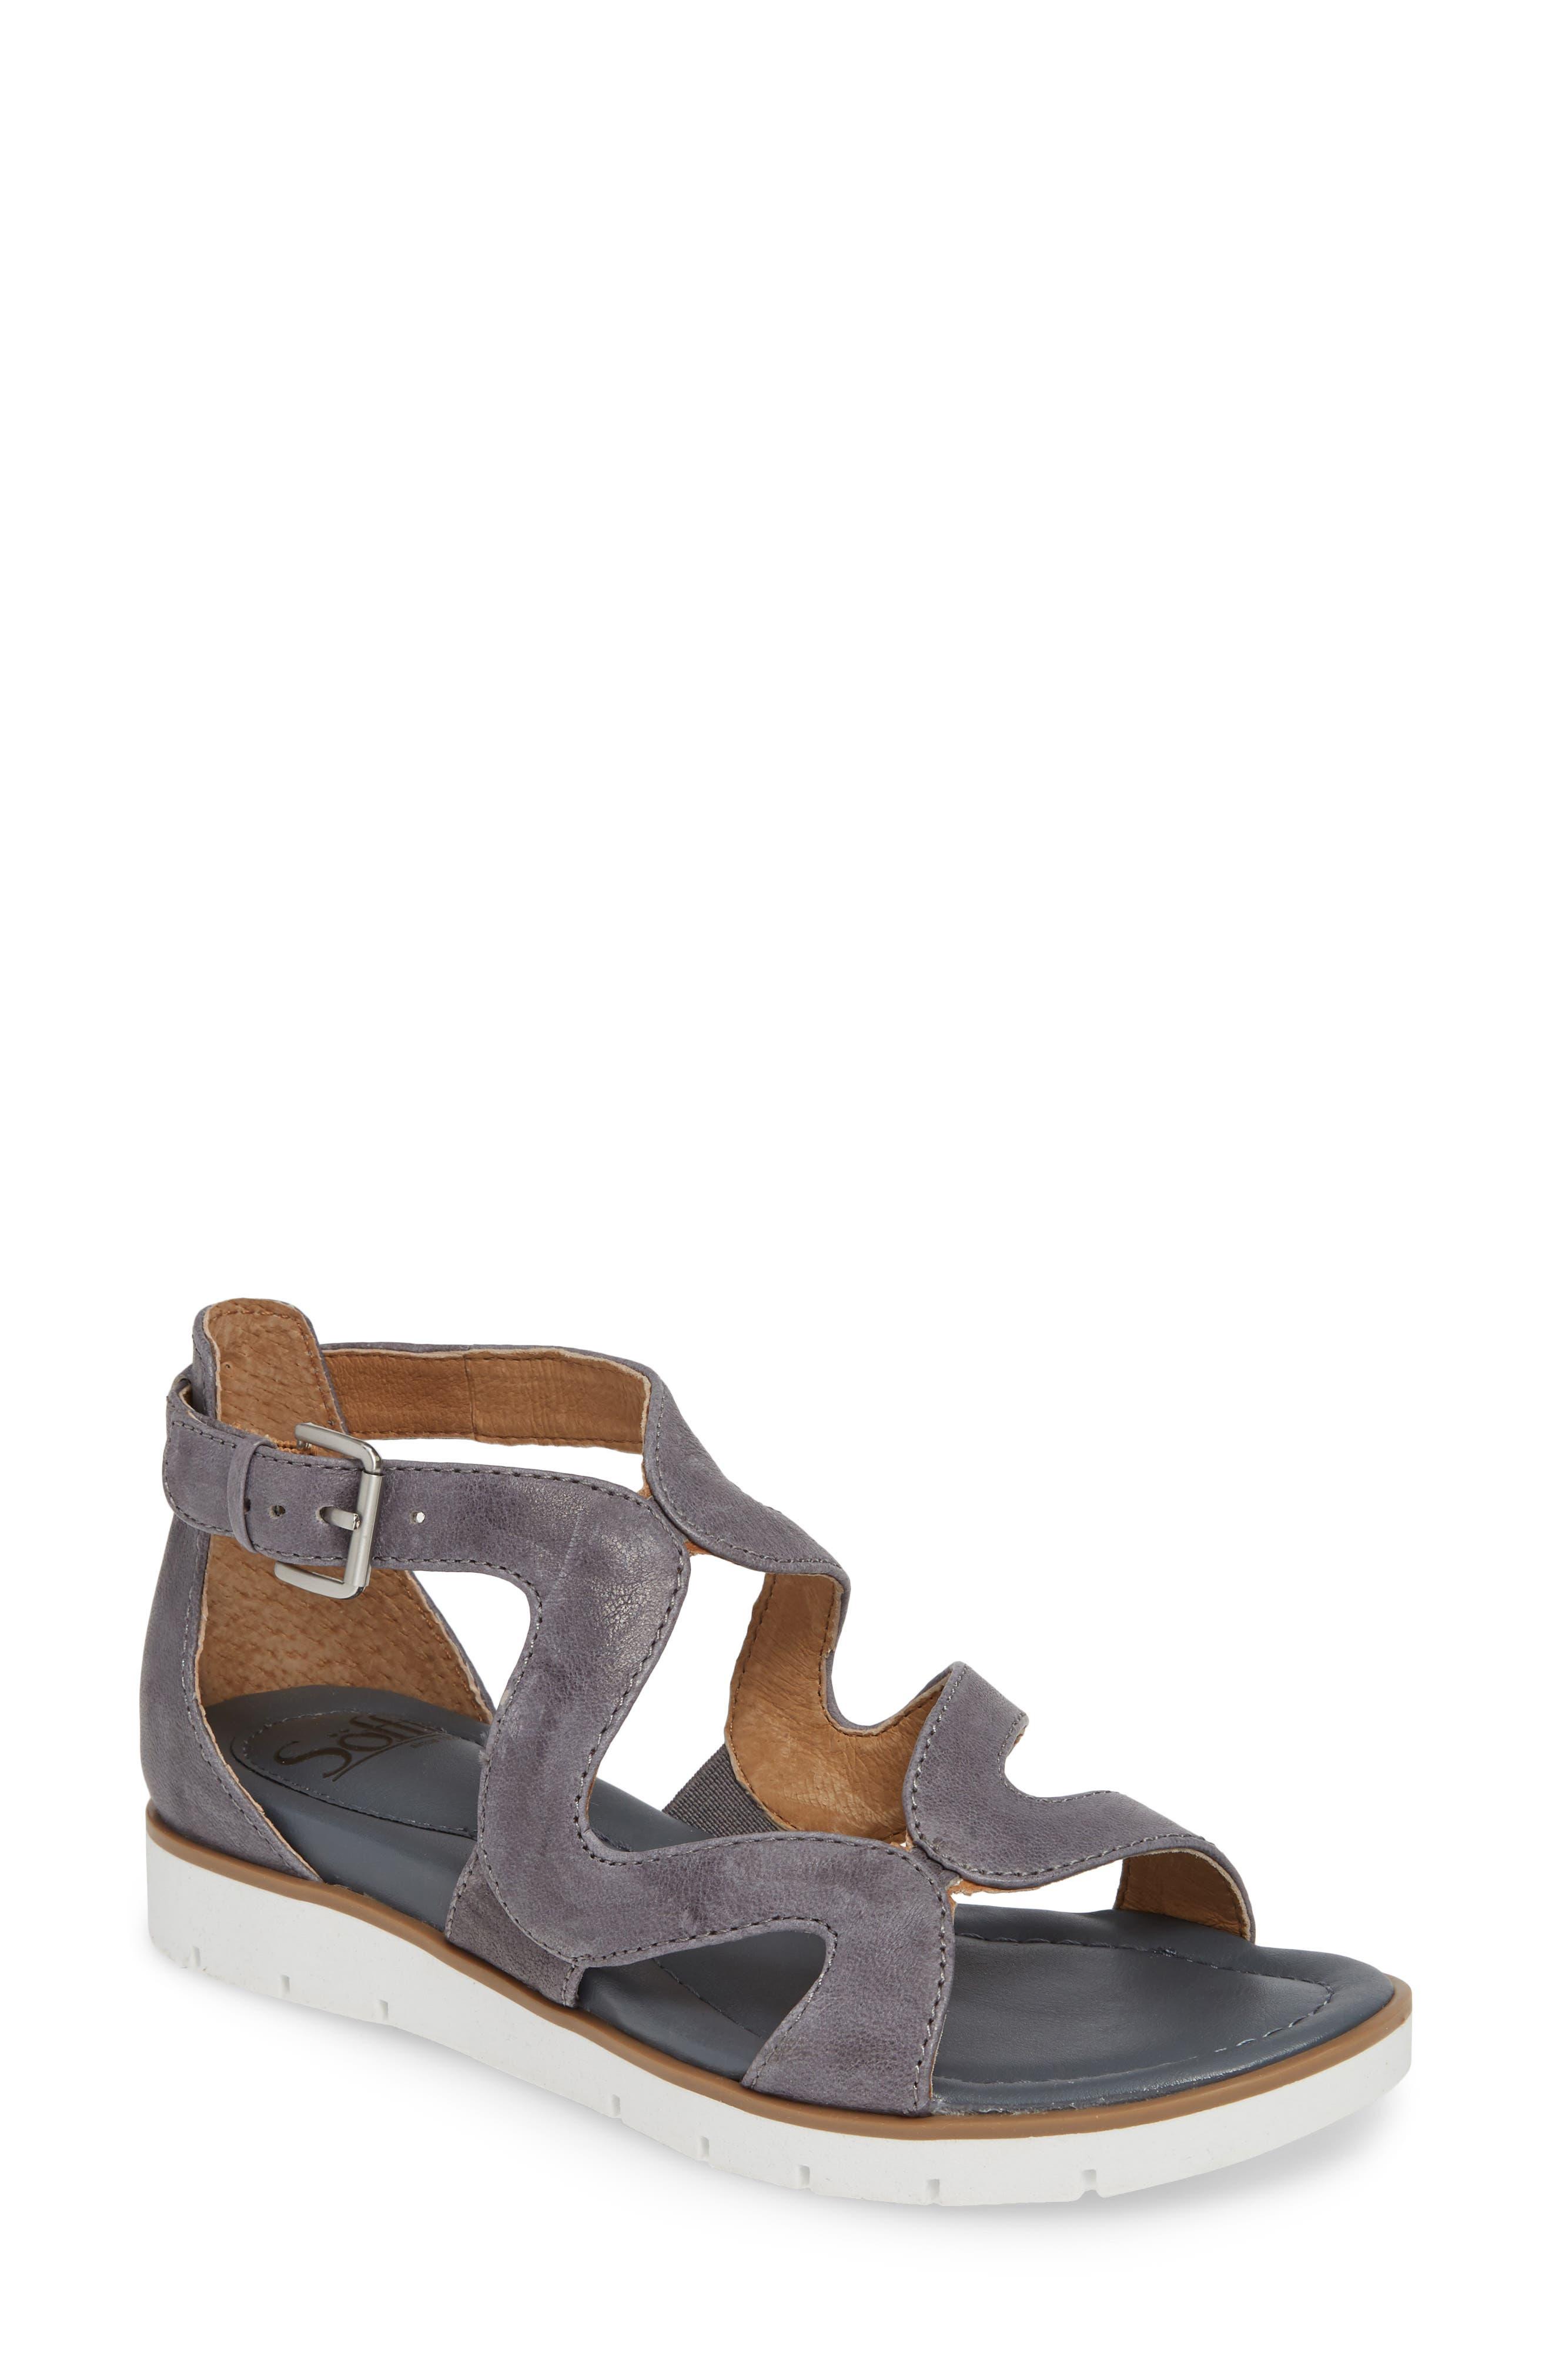 6dfc6103ca3 Sofft  Malana  Leather Sandal